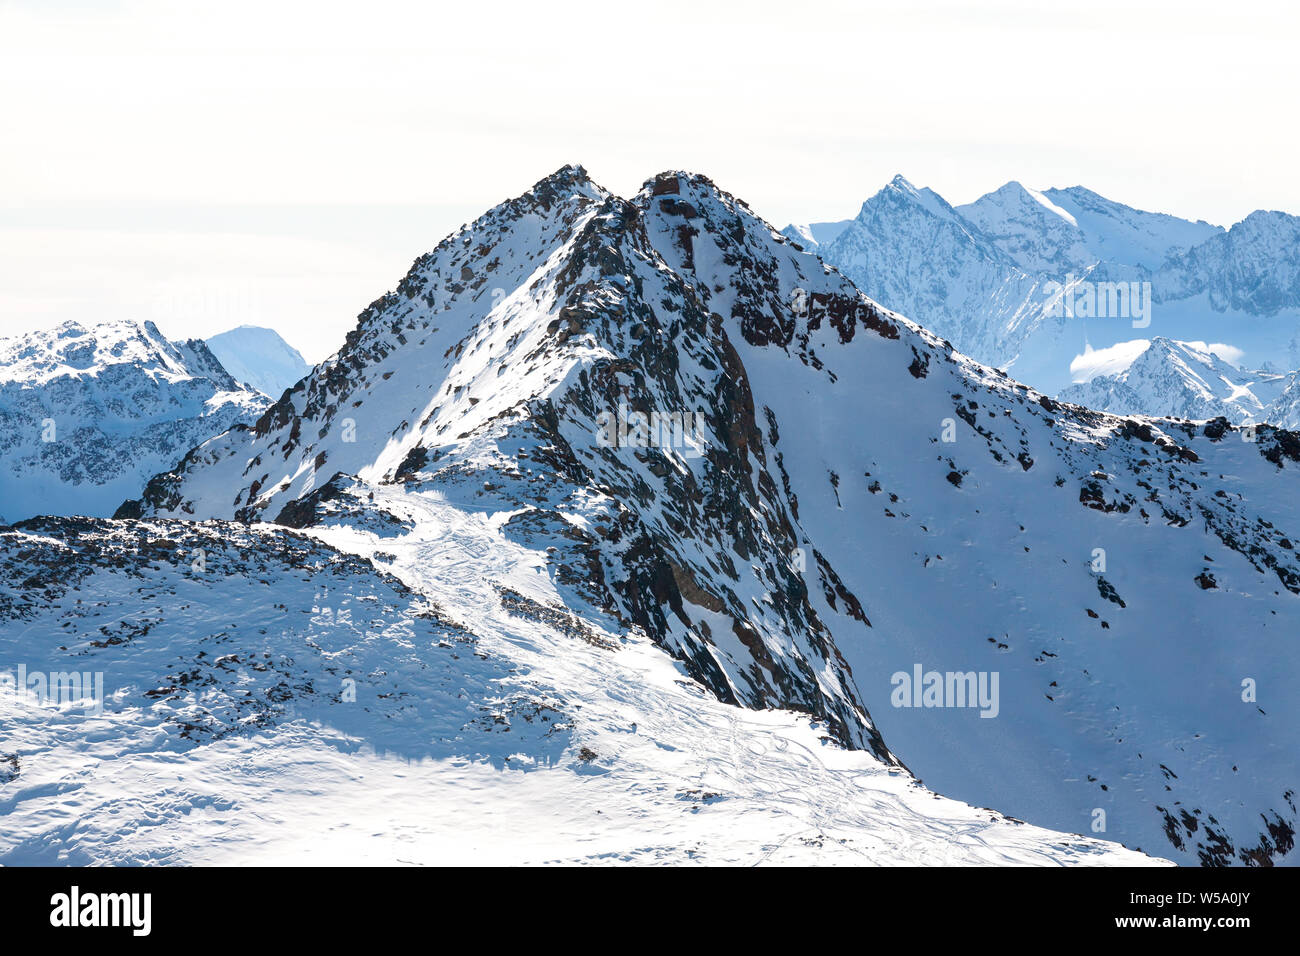 High rocky mountain landscape. Beautiful scenic view of mount. Alps ski resort. Austria, Stubai, Stubaier Gletscher Stock Photo